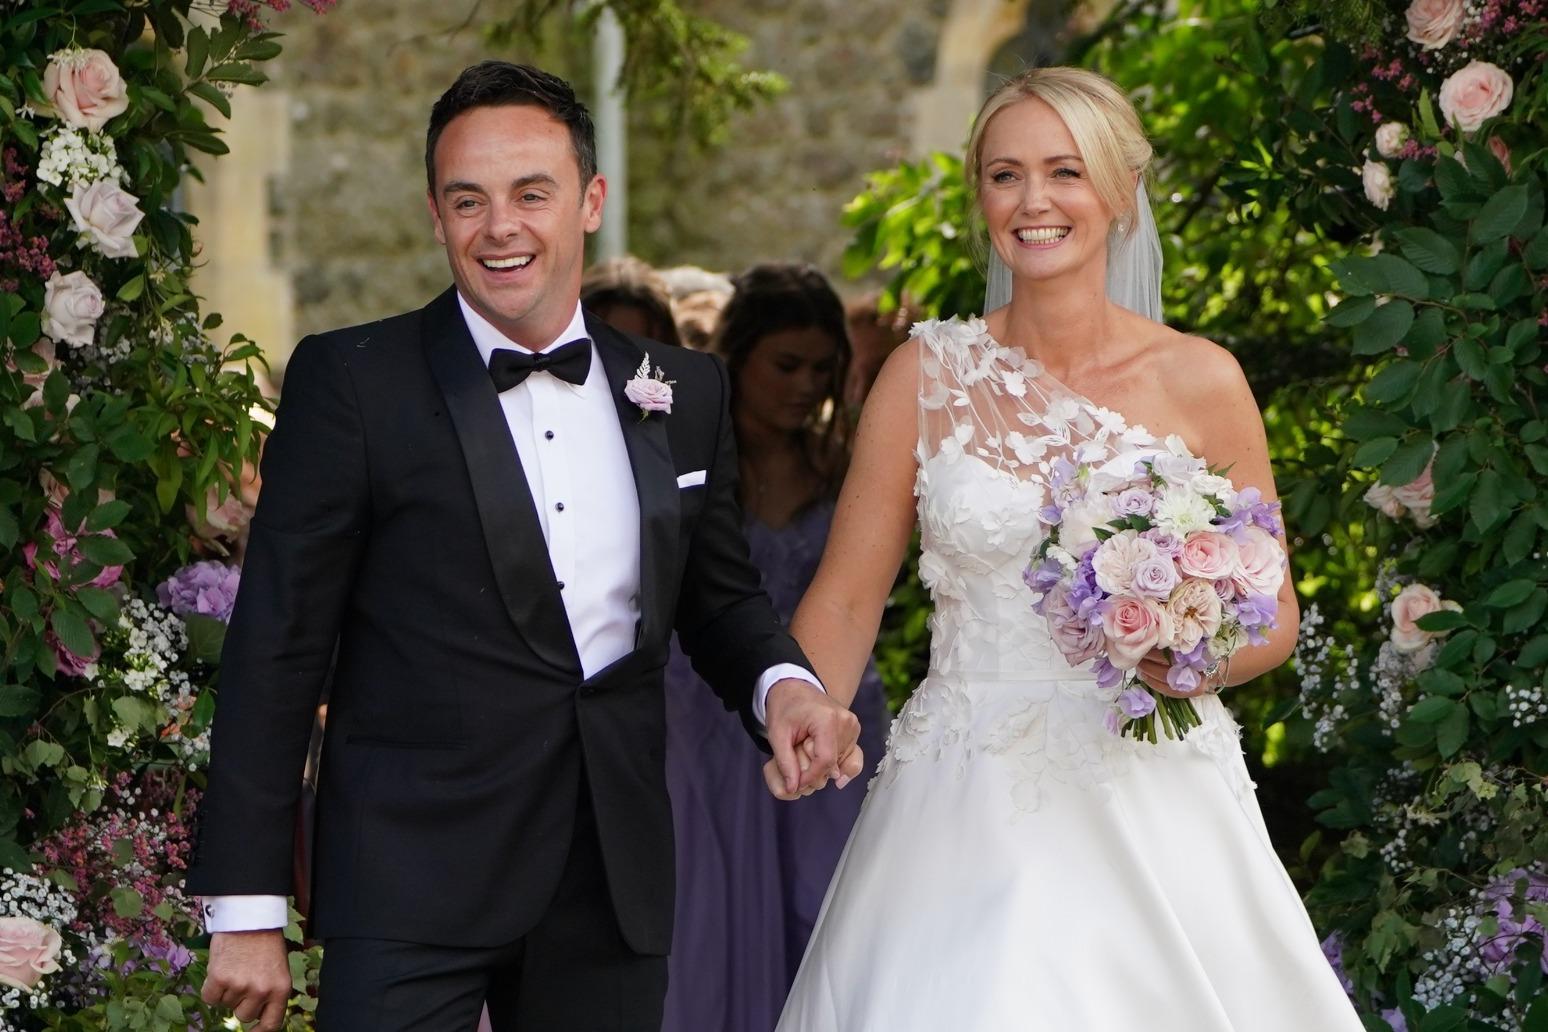 Ant McPartlin weds Anne-Marie Corbett